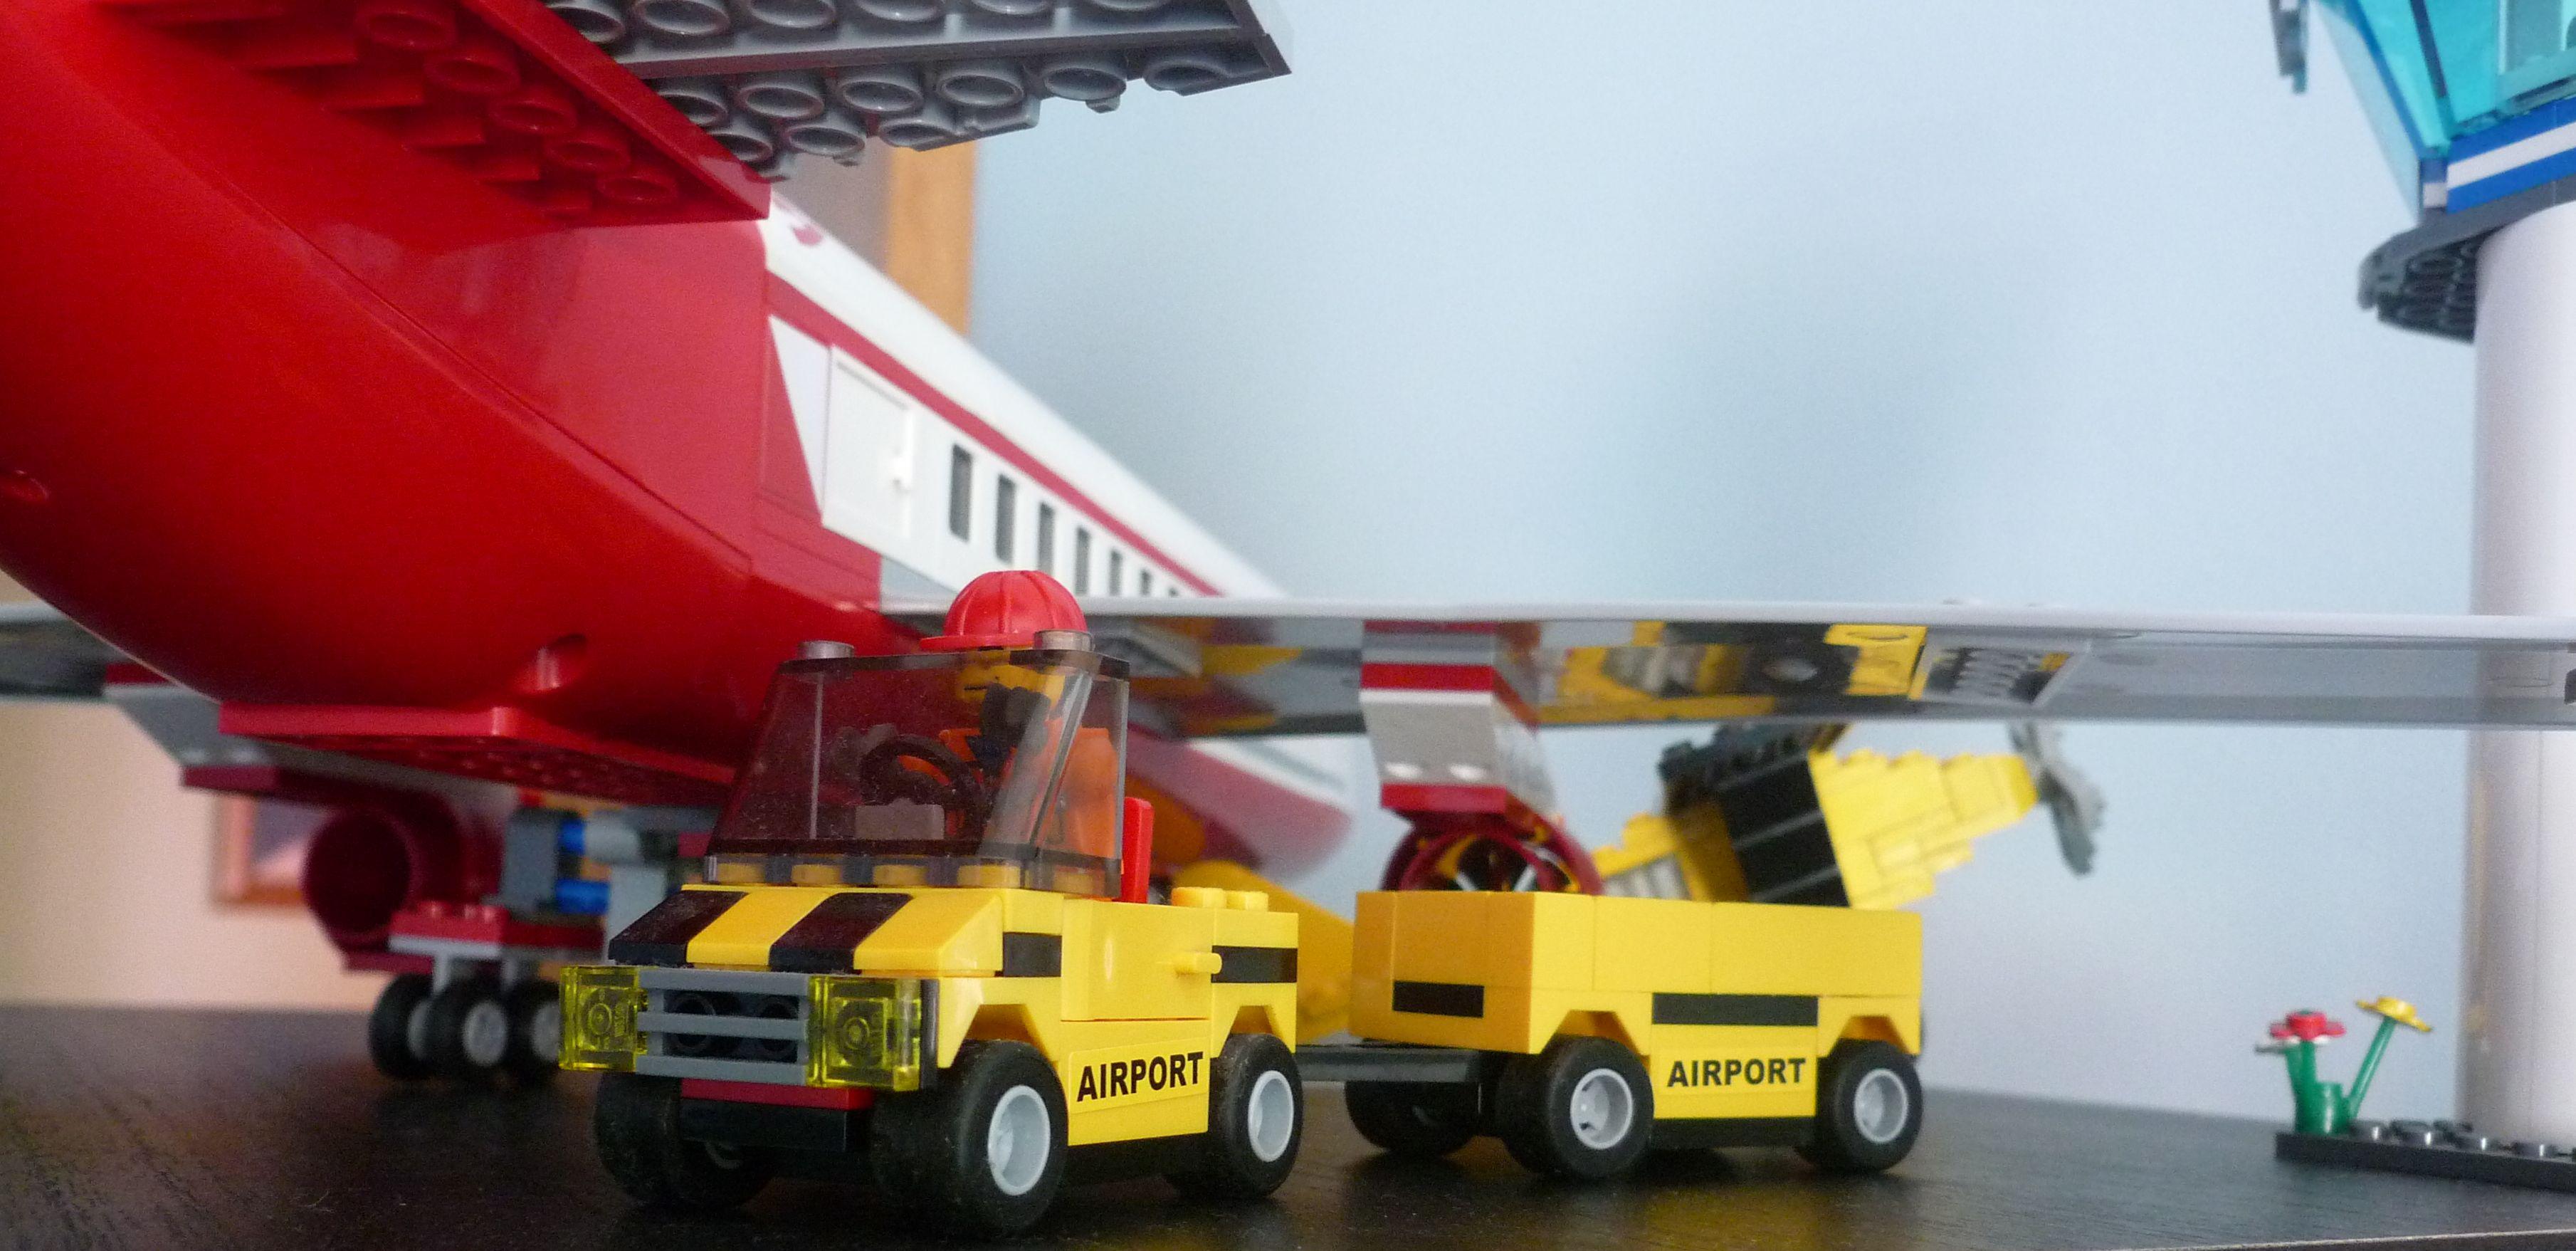 Lego City 3182 Airport I Brick City